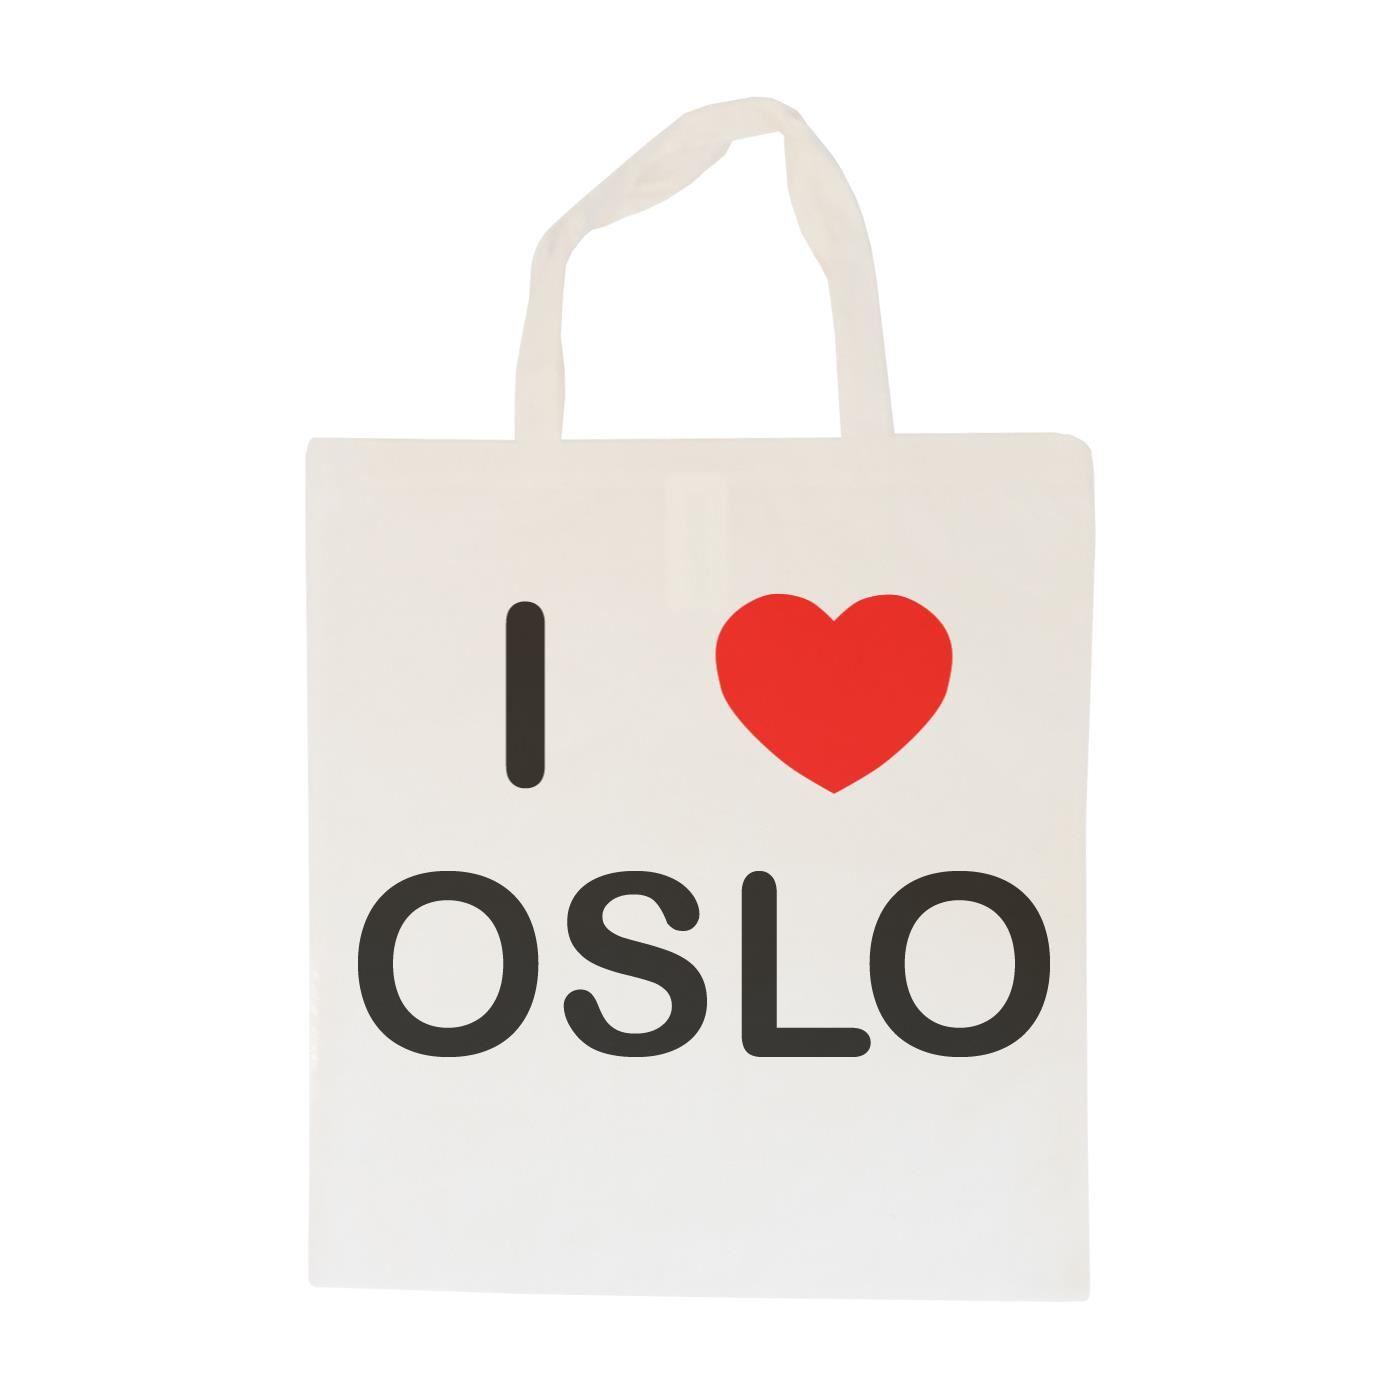 I Love Oslo - Cotton Bag   Size choice Tote, Shopper or Sling